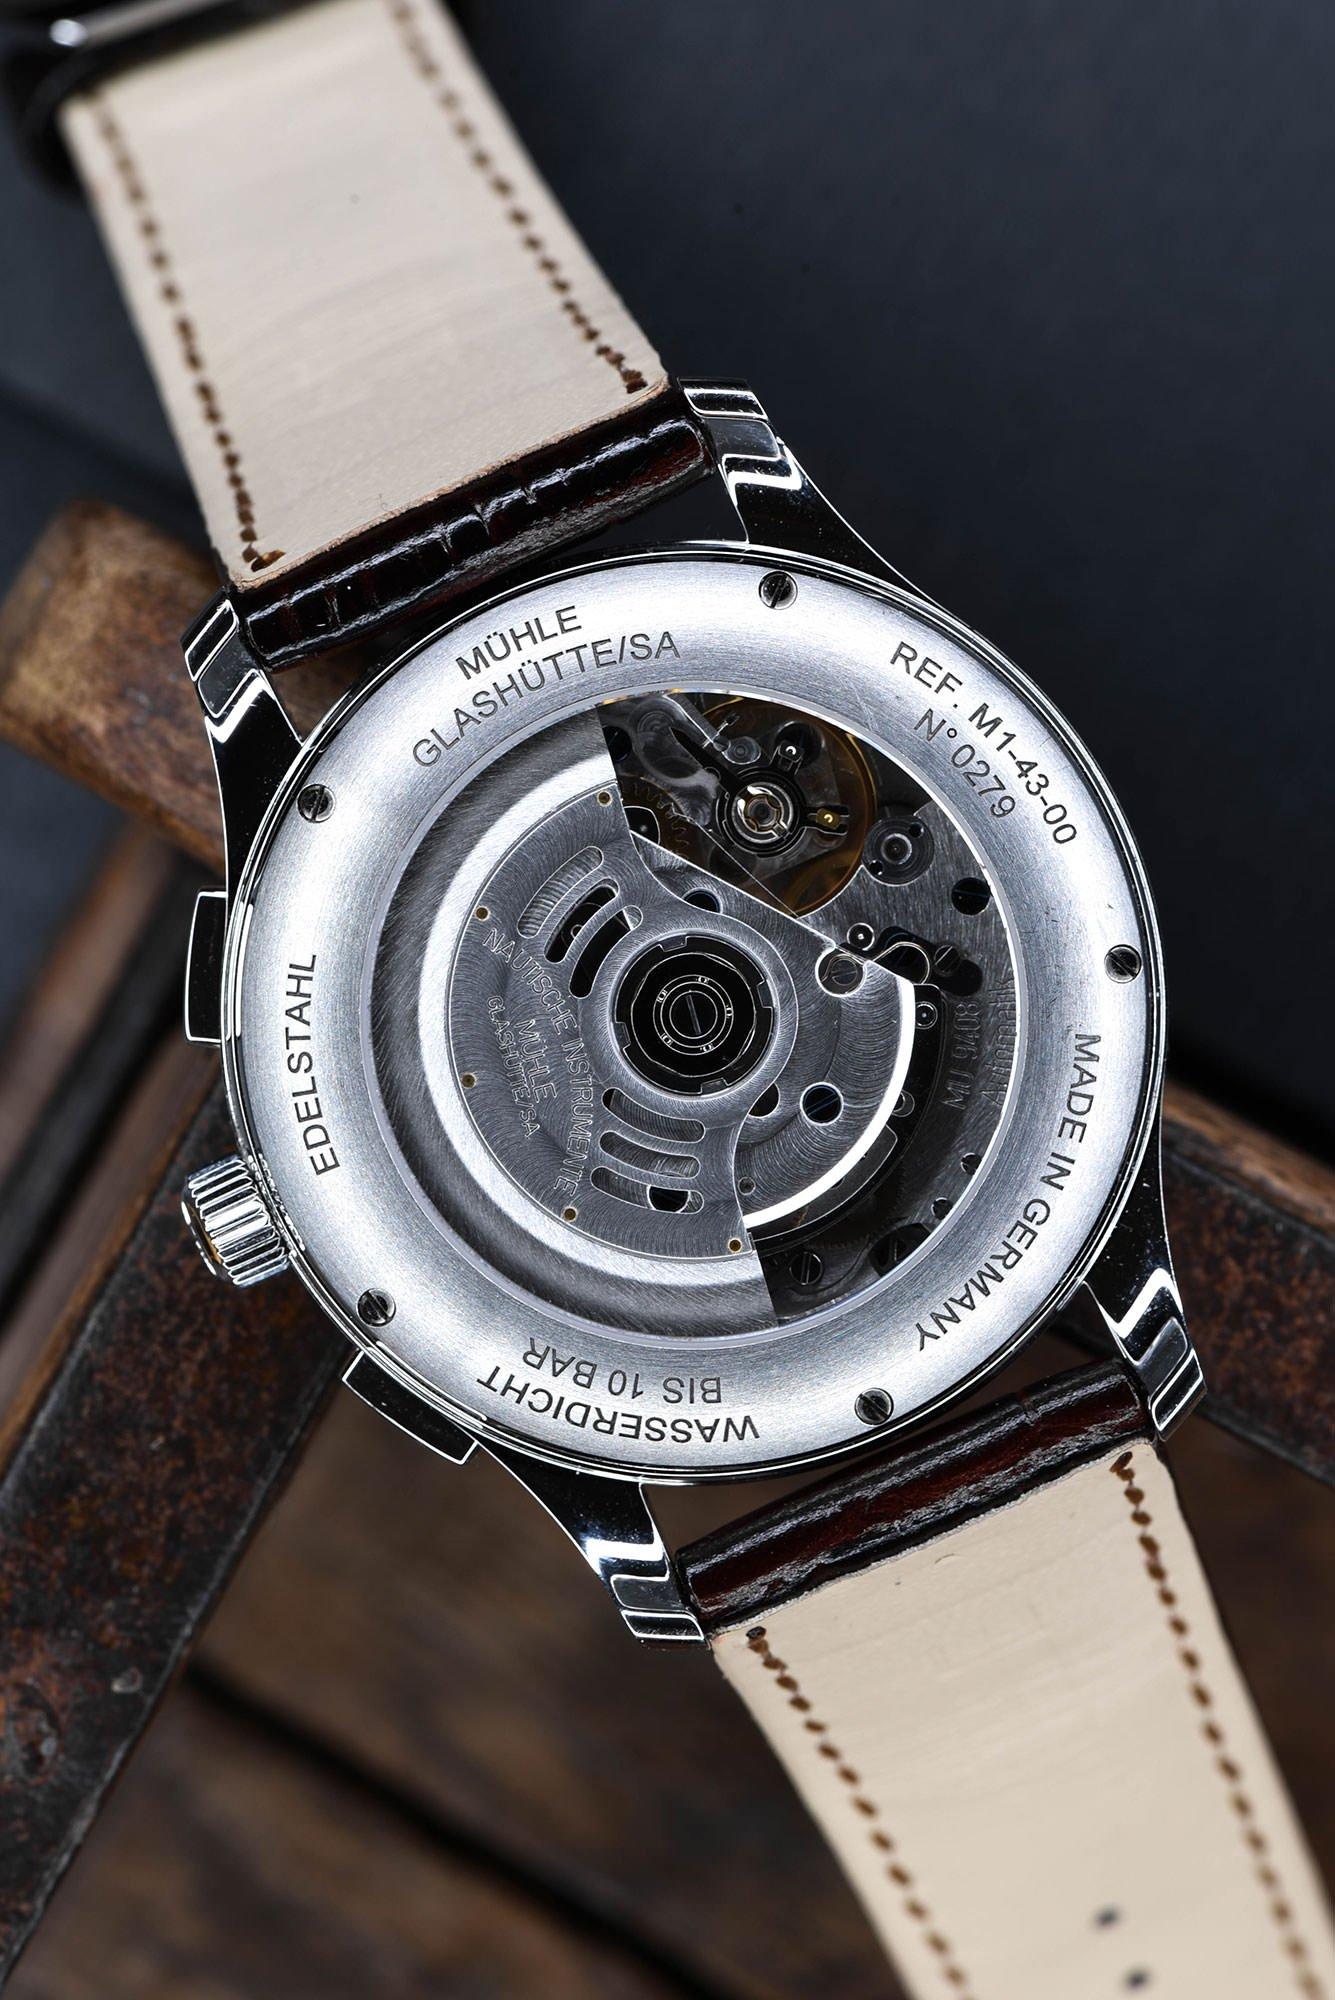 Mühle-Glashütte Lunova Chronograph Review